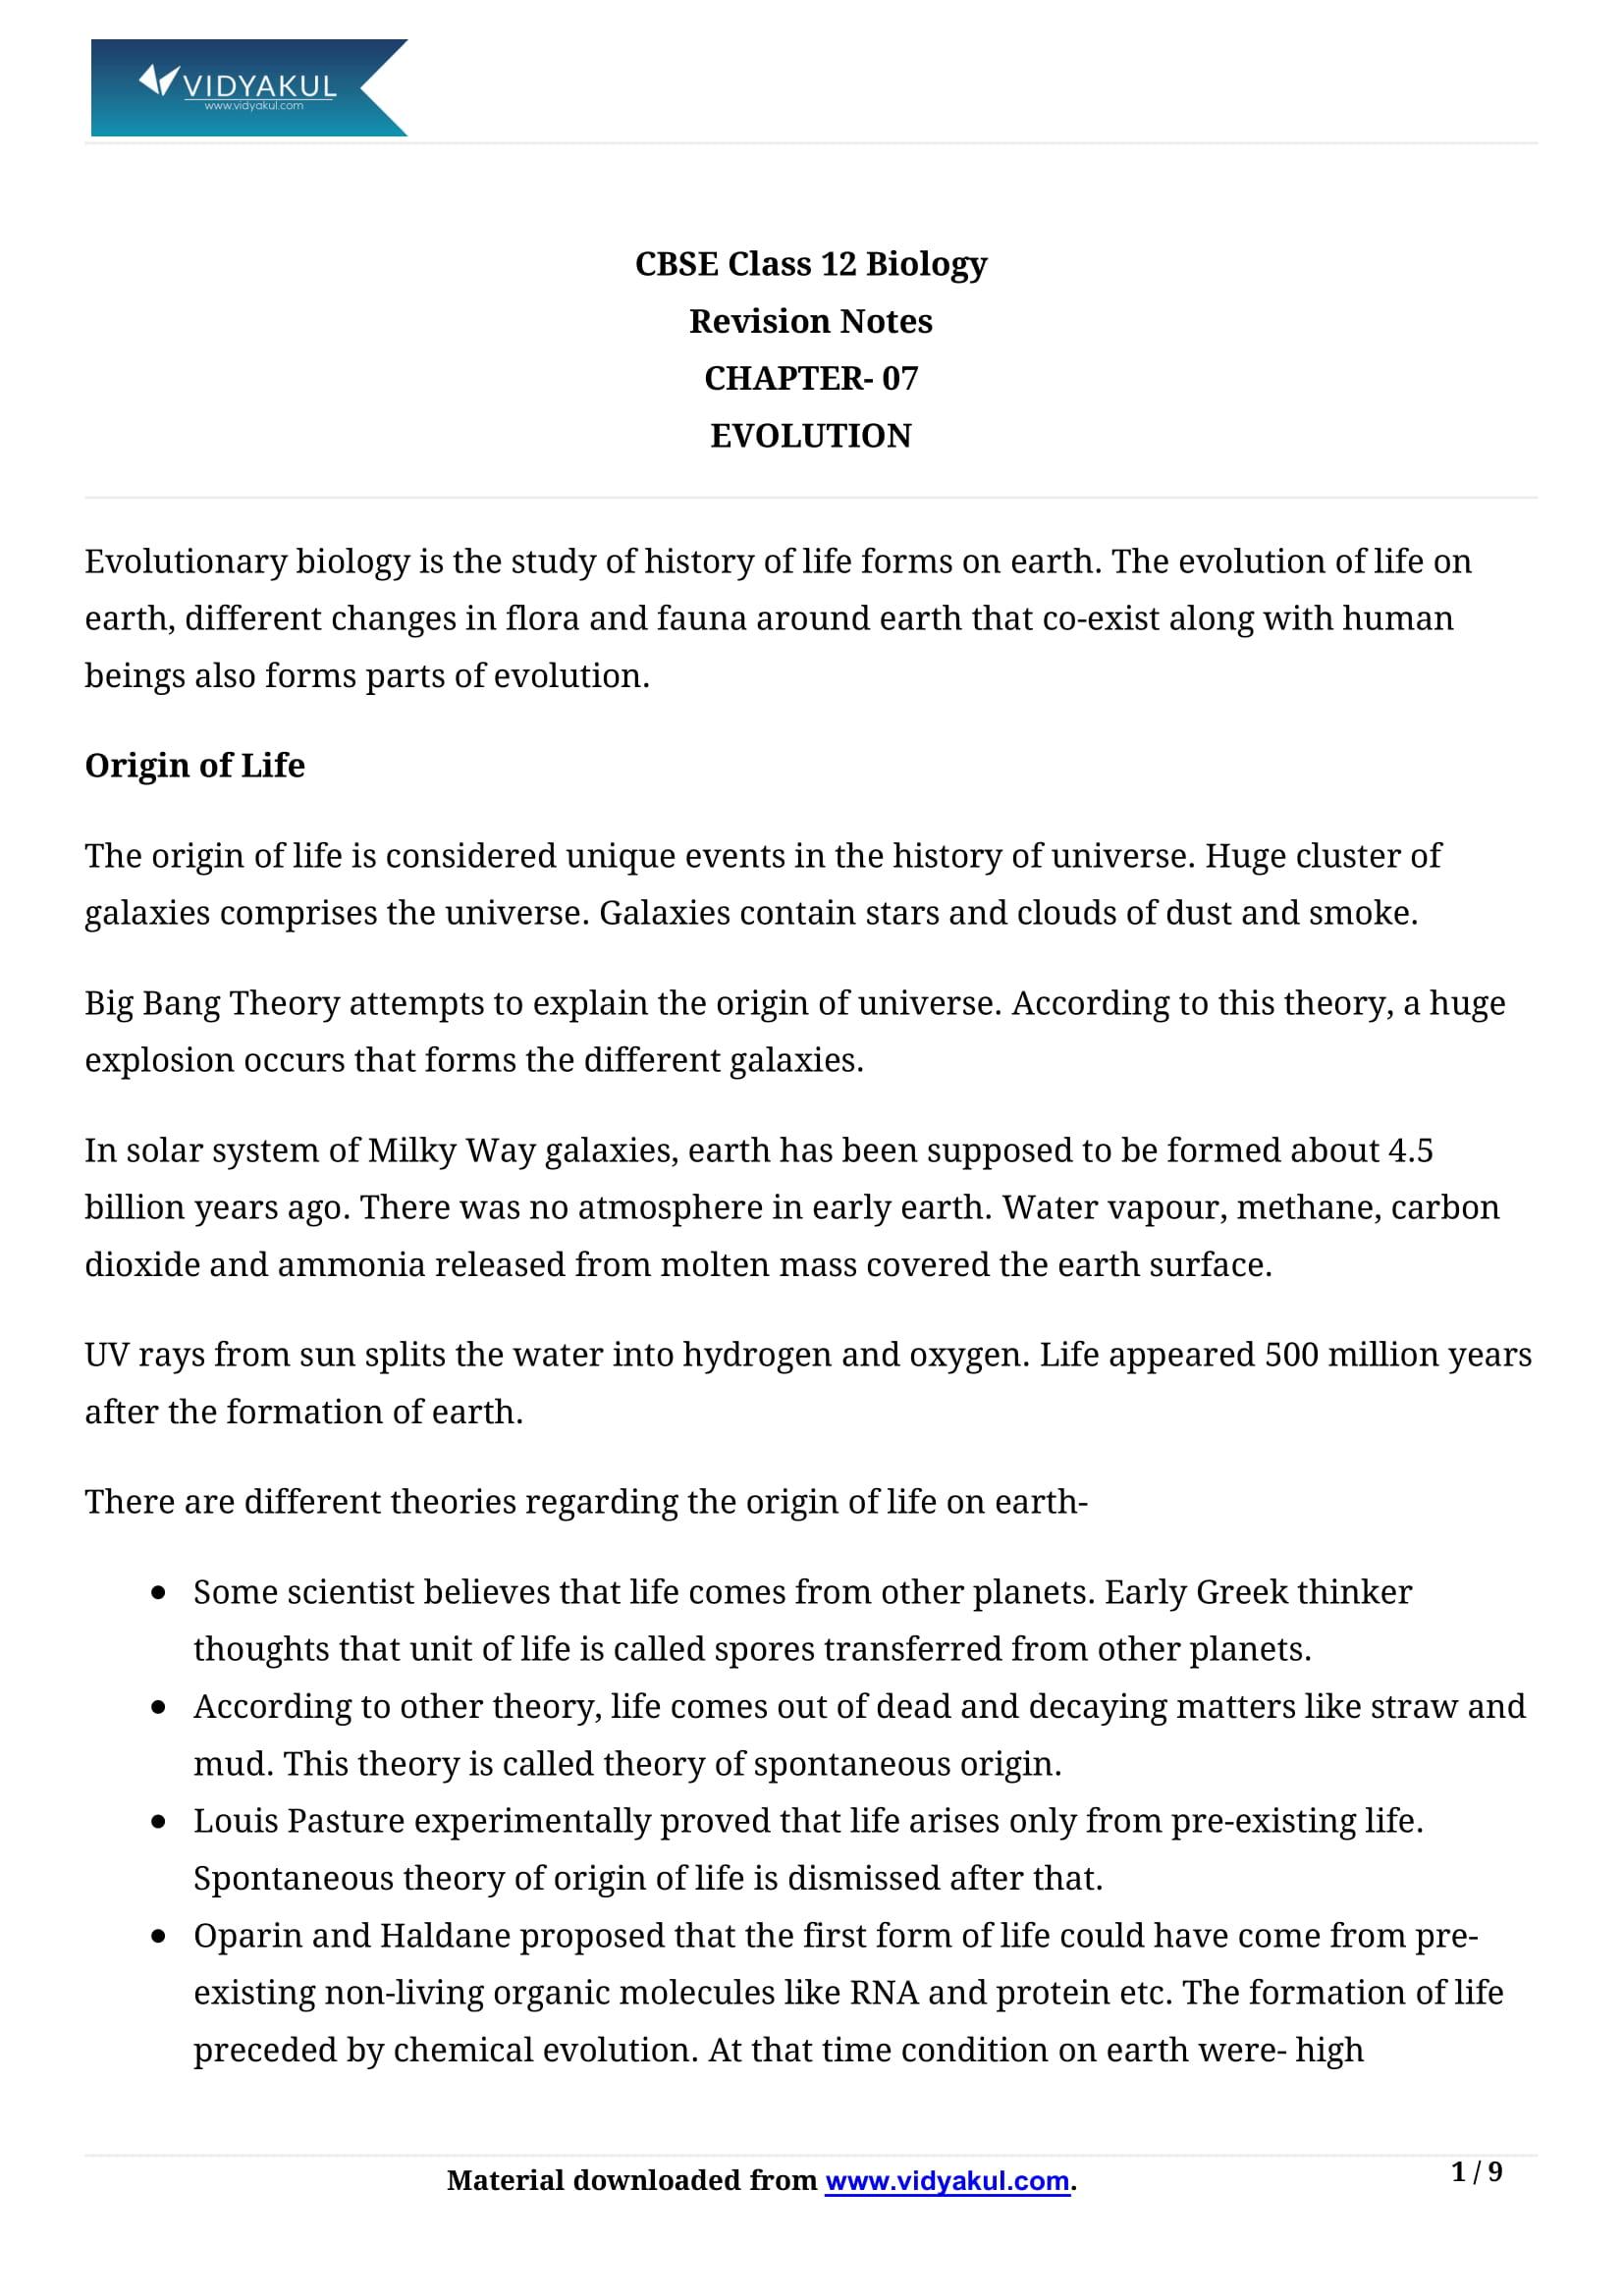 Evolution Class 12 Notes | Vidyakul